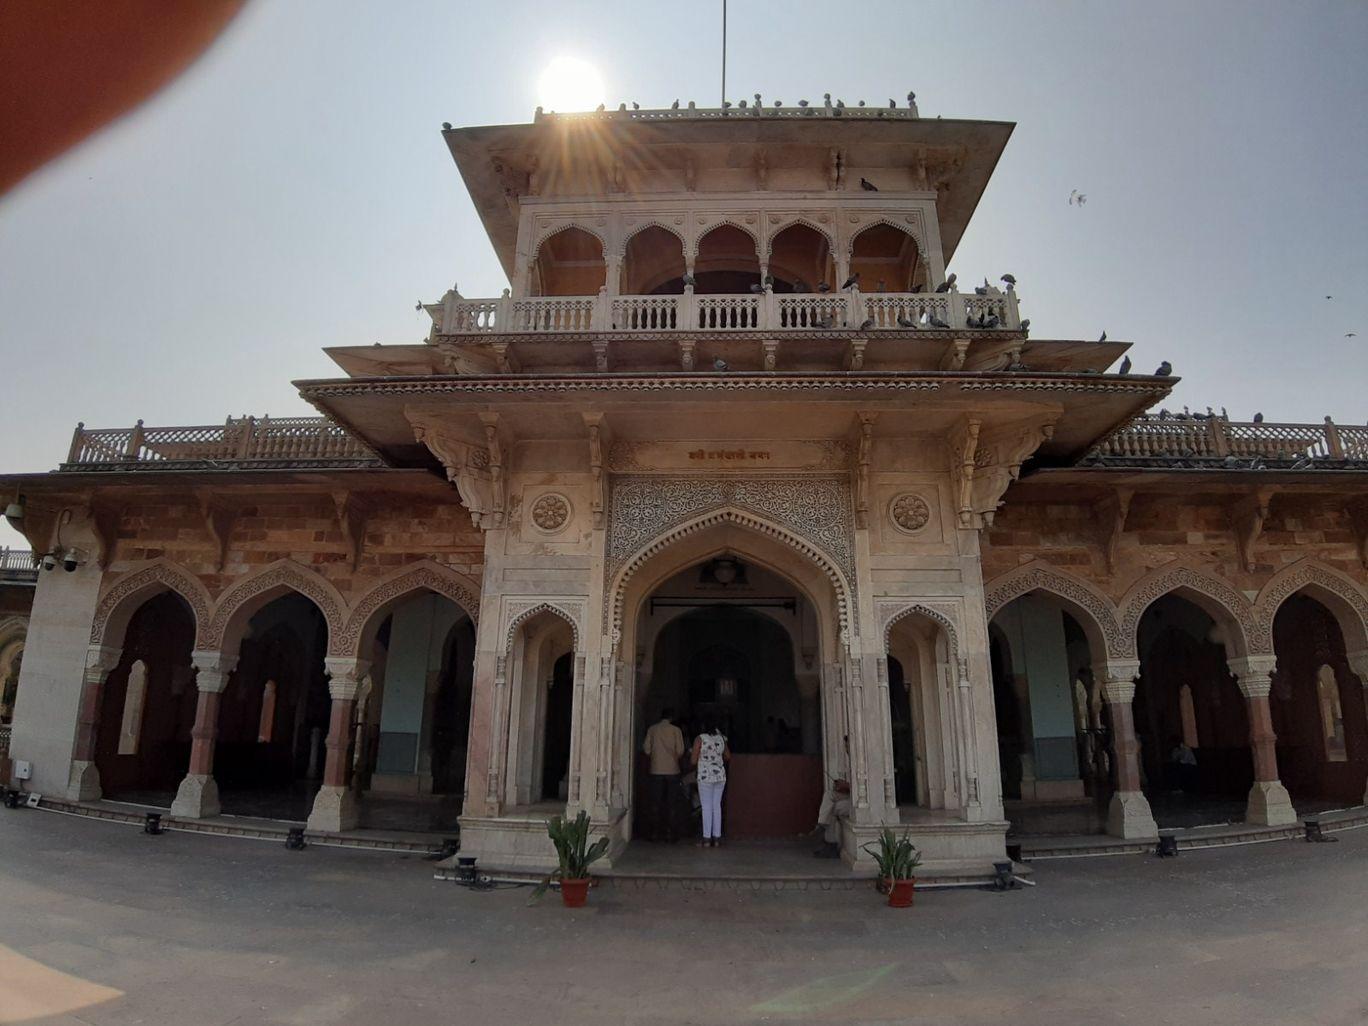 Photo of Jaipur By Sudhir Soni